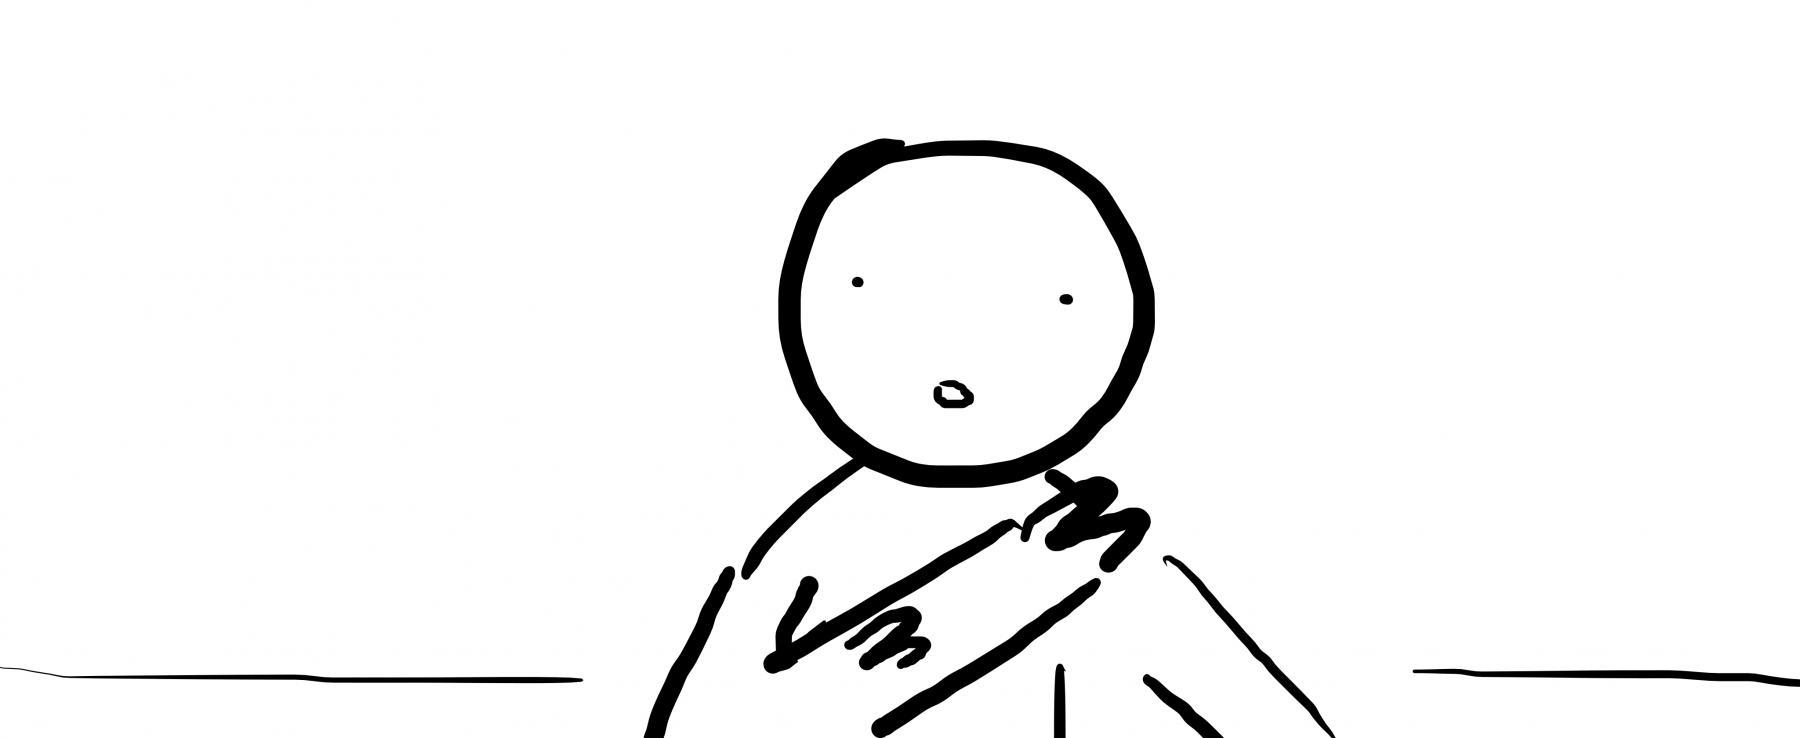 Nut-Thumbnail-Rough-Board00316